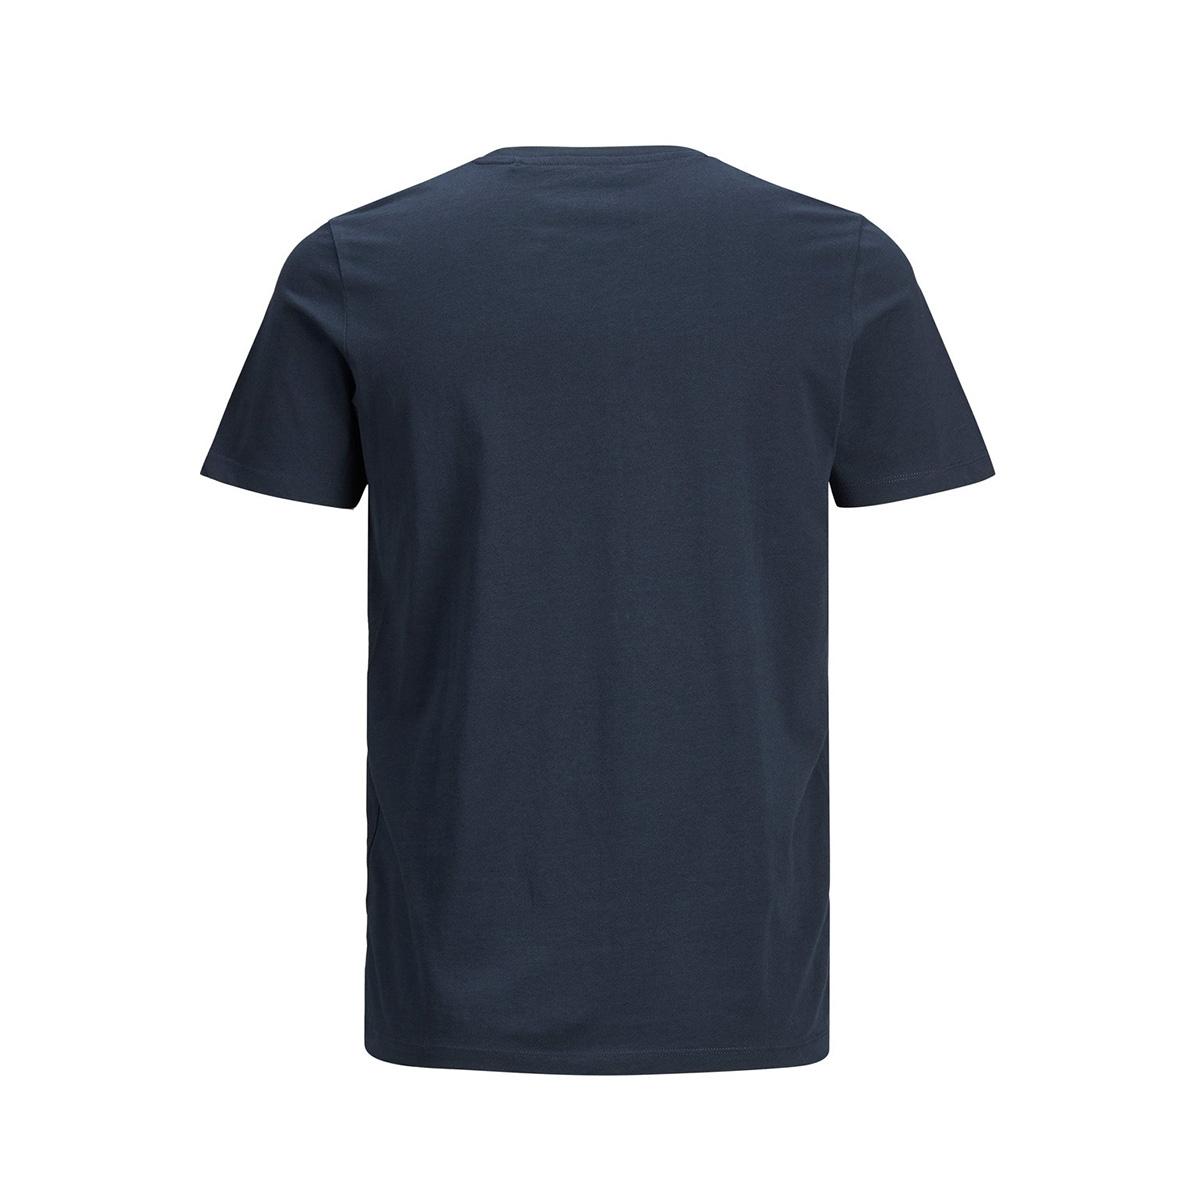 jjelogo tee ss o-neck 2 col ss20 no 12164848 jack & jones t-shirt navy blazer/slim